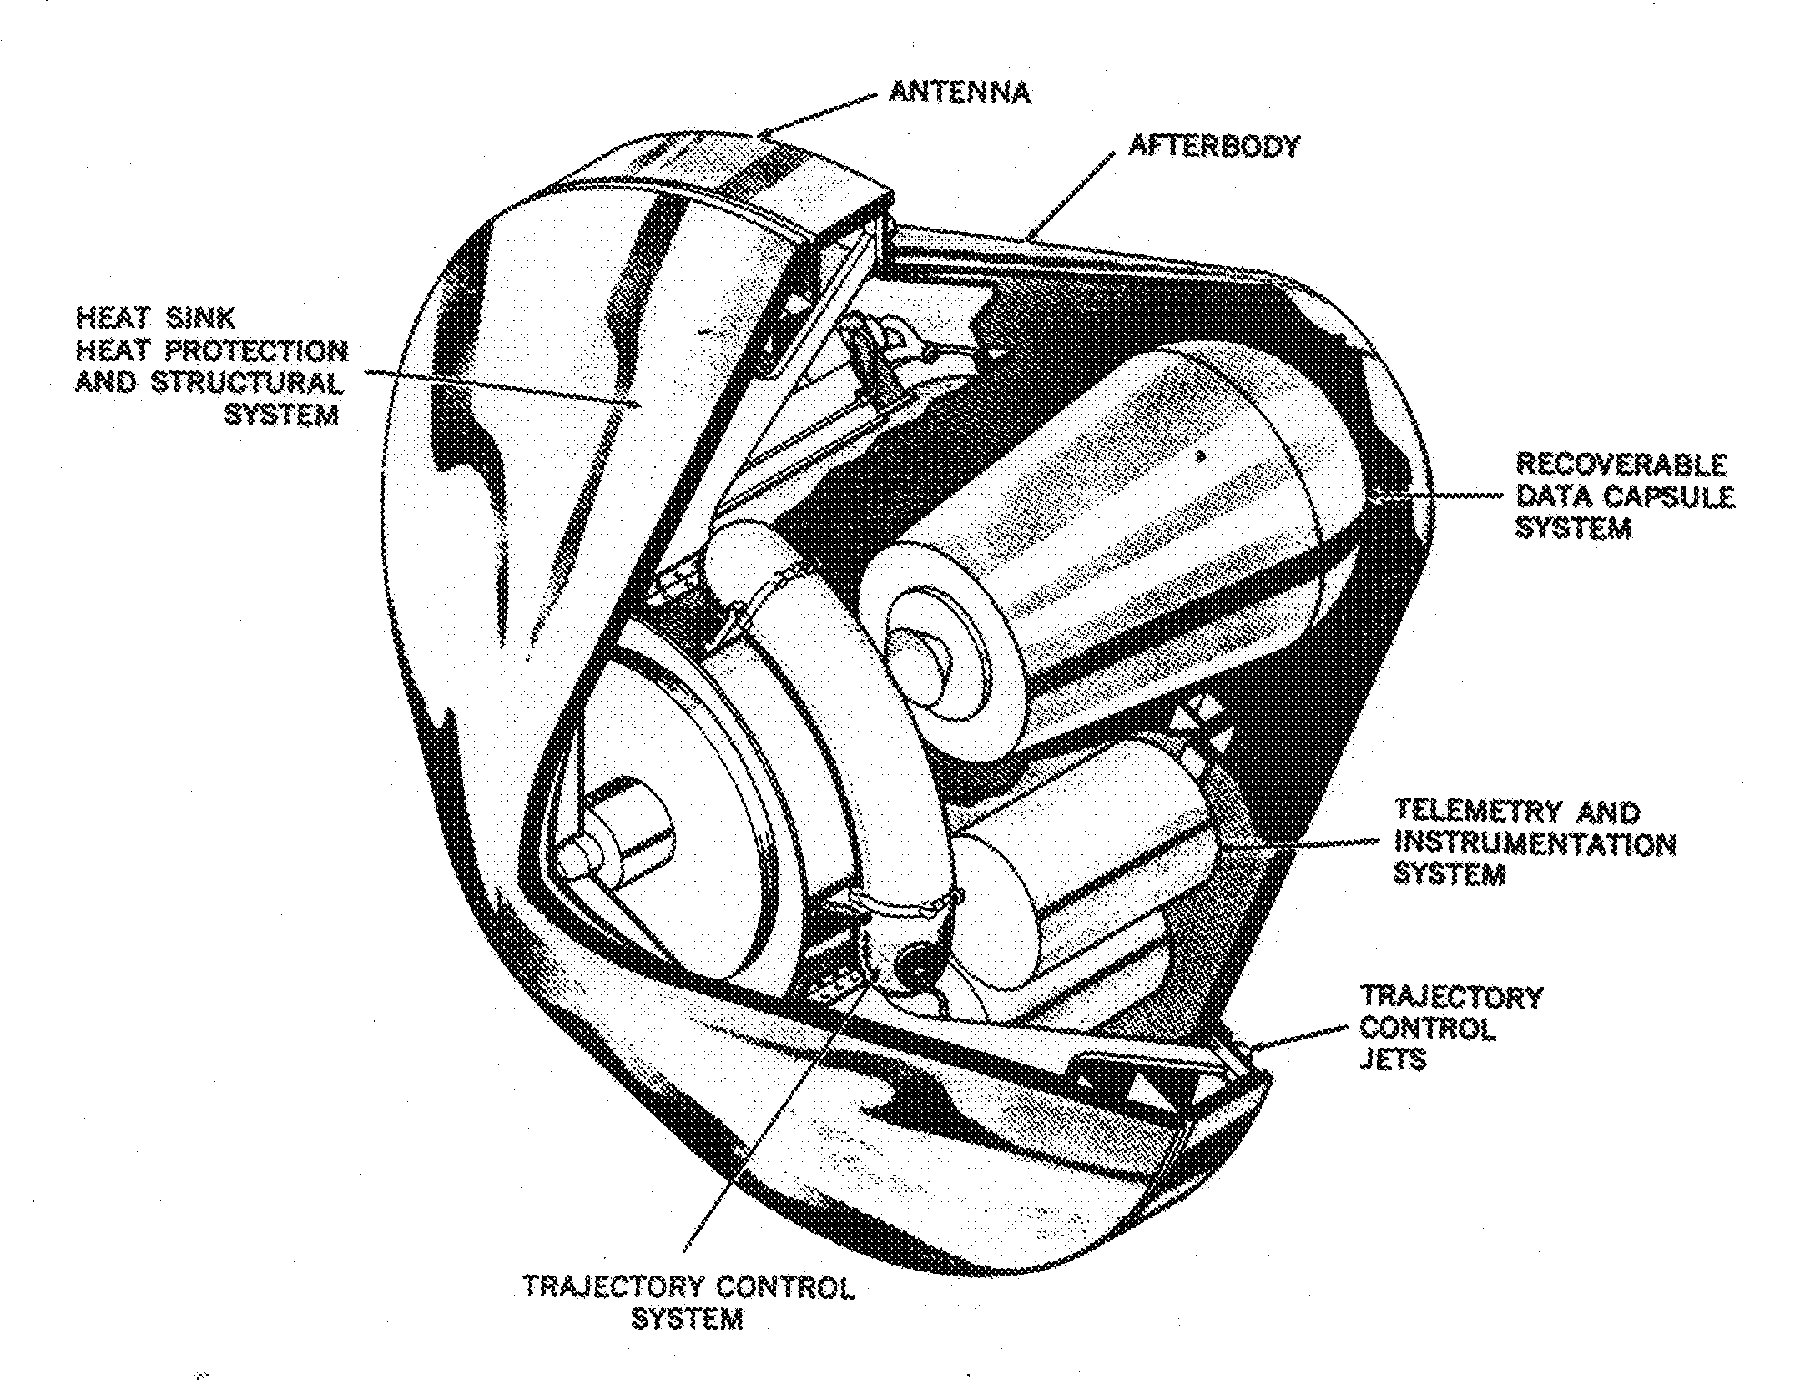 Figure 1 Ge Mark 2 Prototype Reentry Vehicle